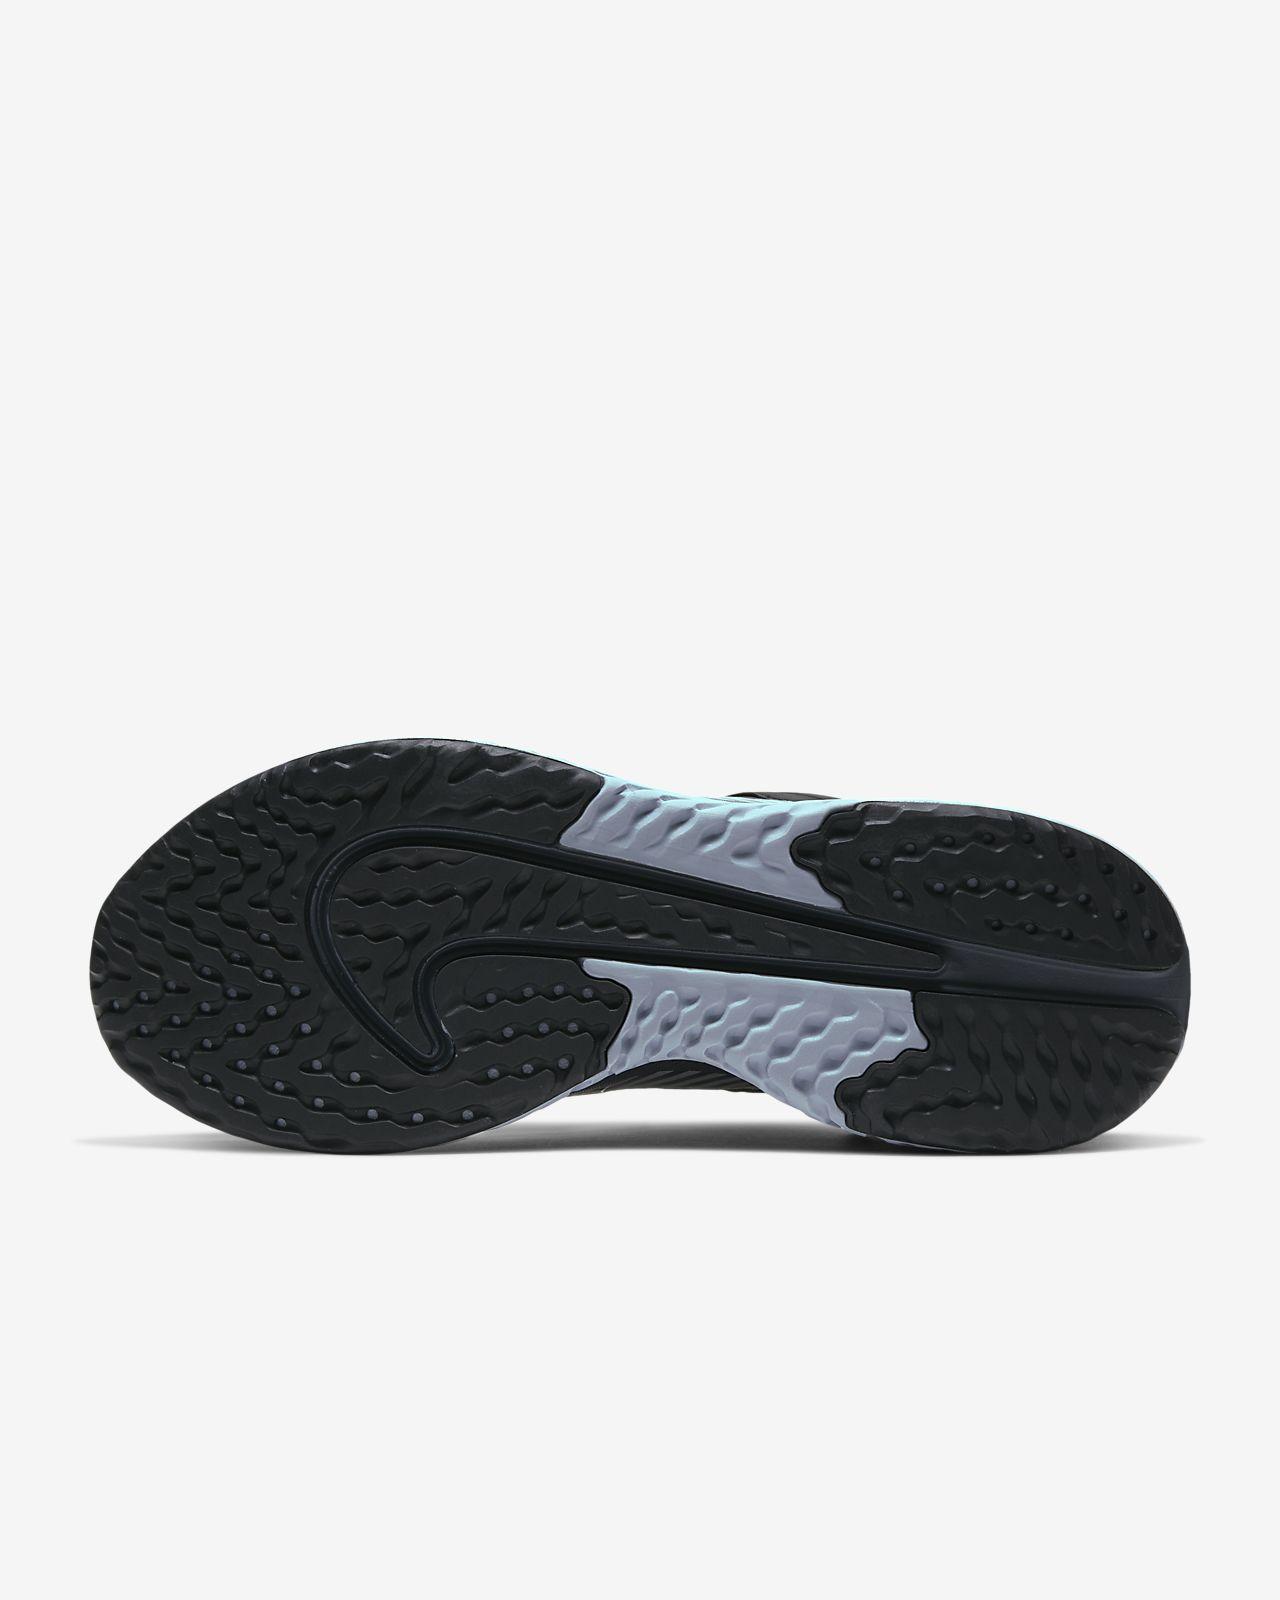 Zapatillas Running Nike Niños Chicas Legend React Shield